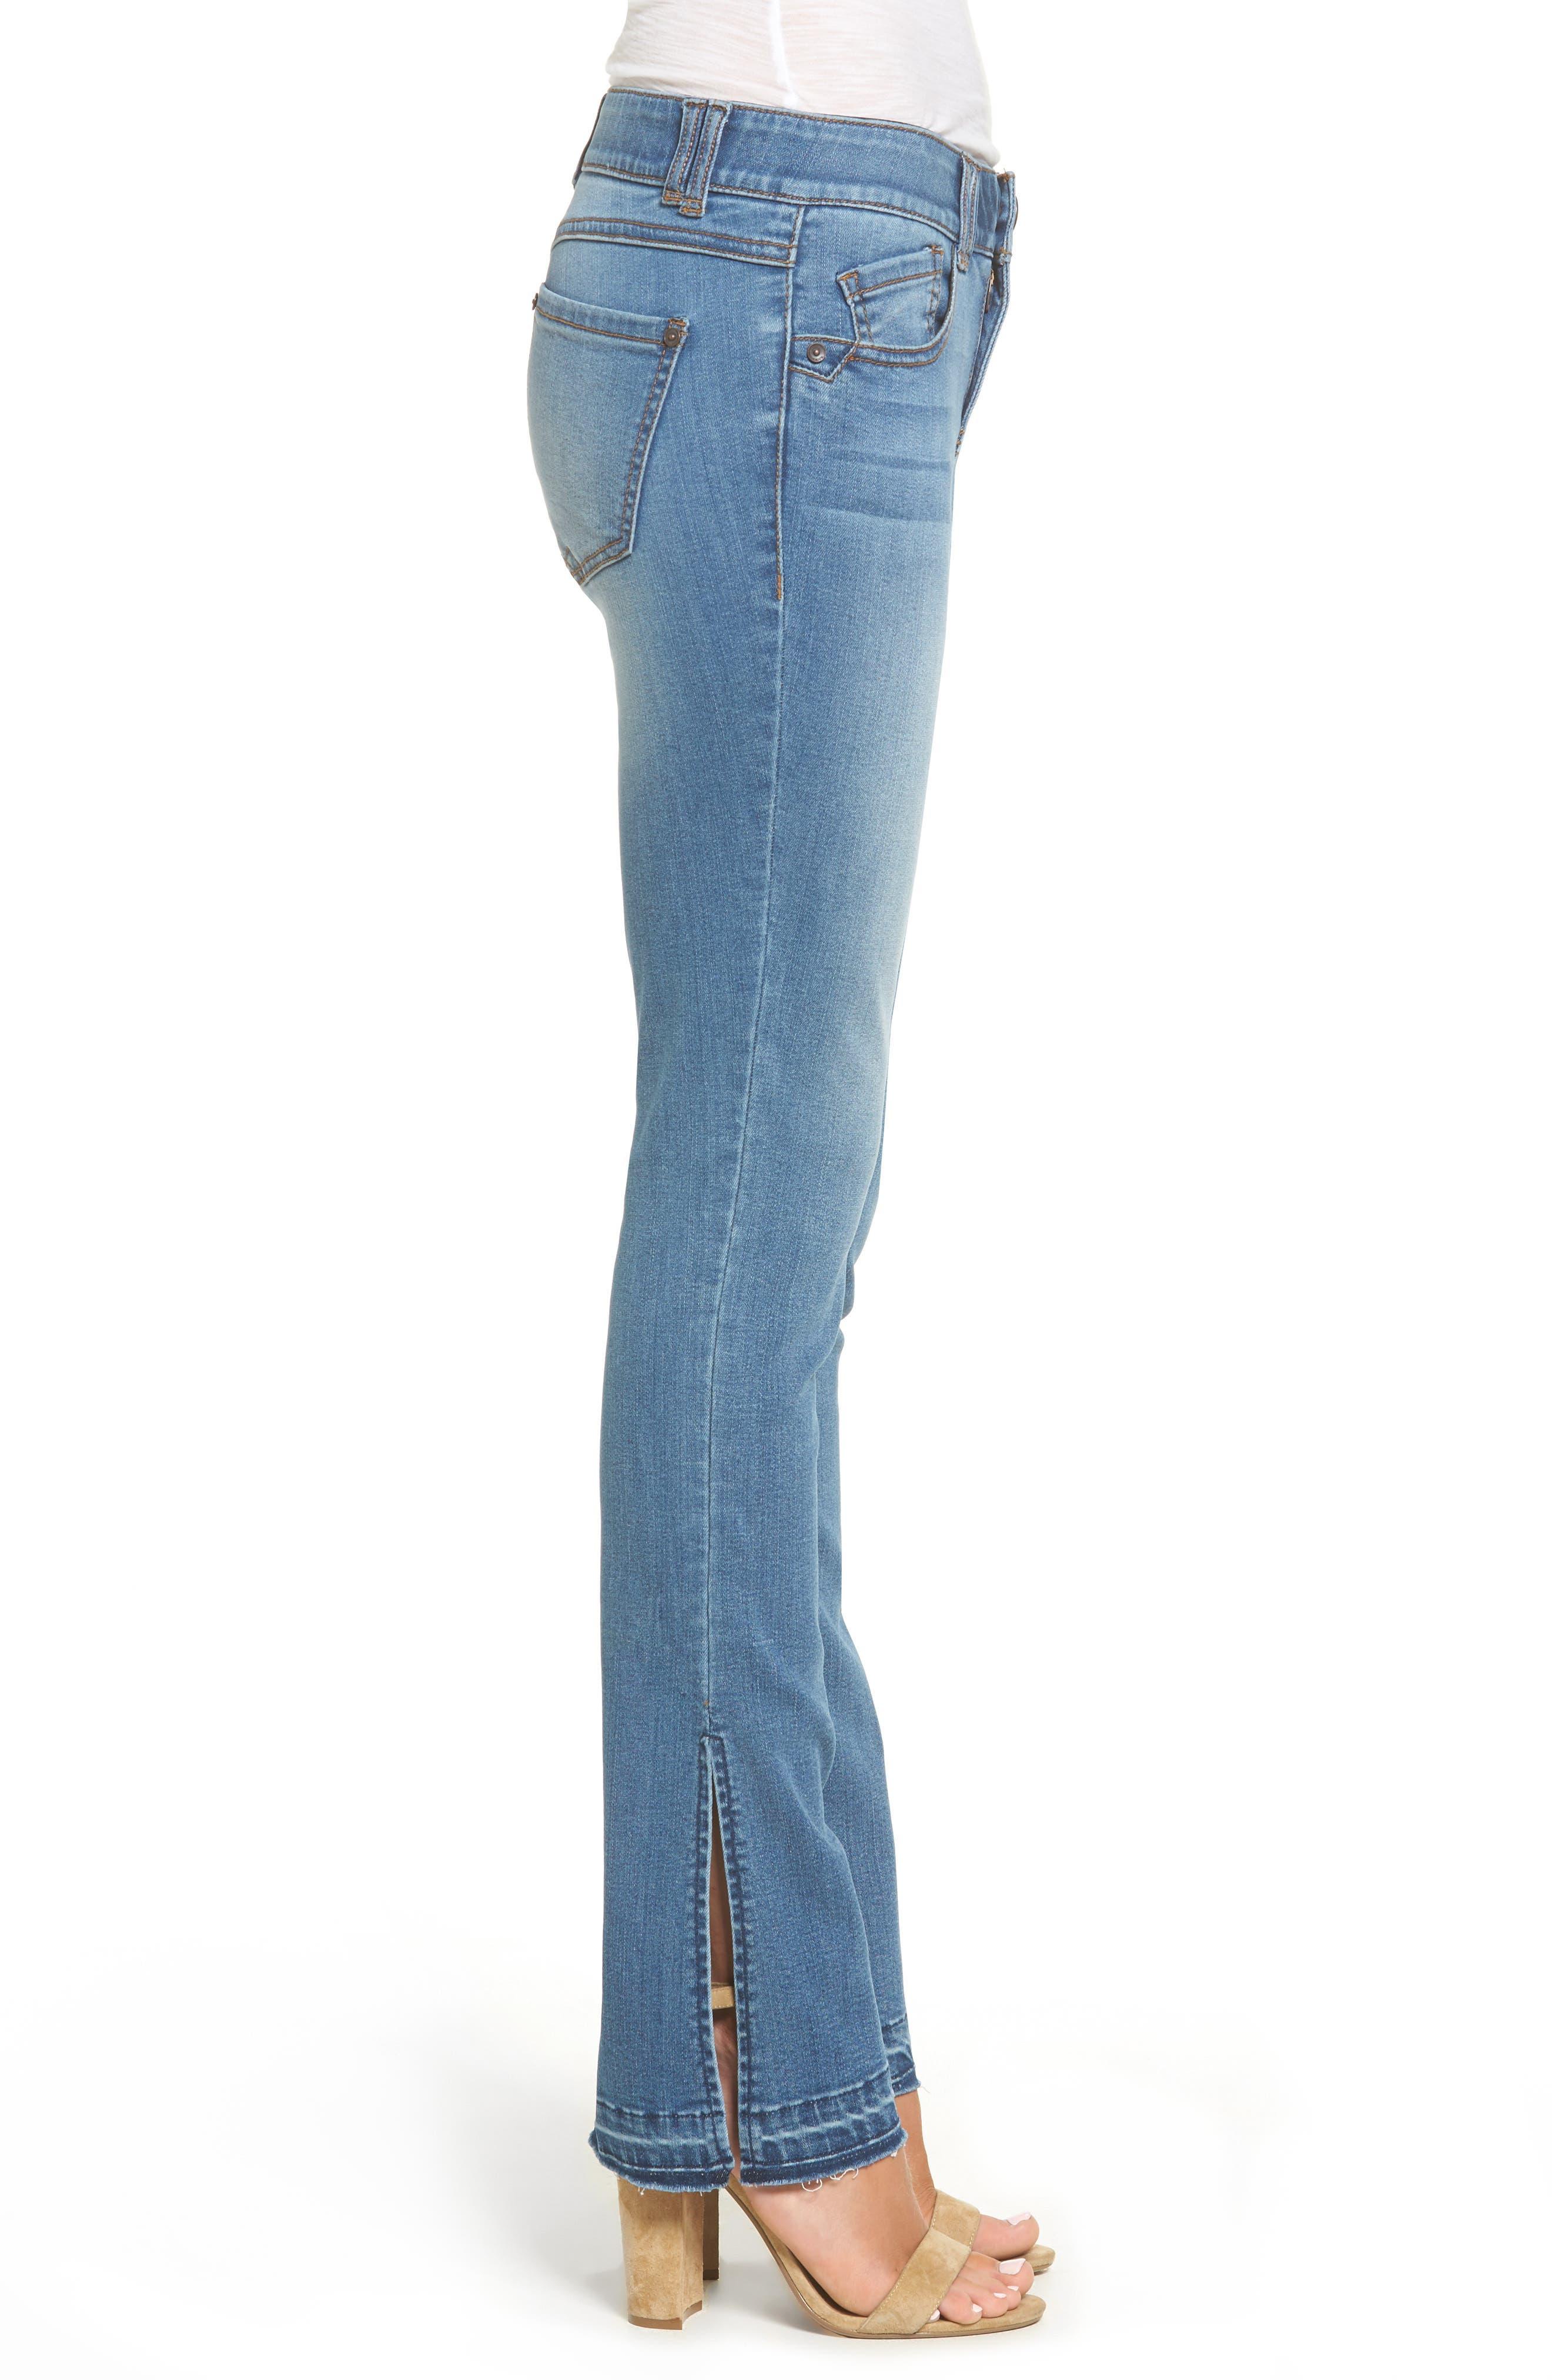 Alternate Image 3  - Wit & Wisdom Ab-solution Split Release Hem Jeans (Regular & Petite) (Nordstrom Exclusive)